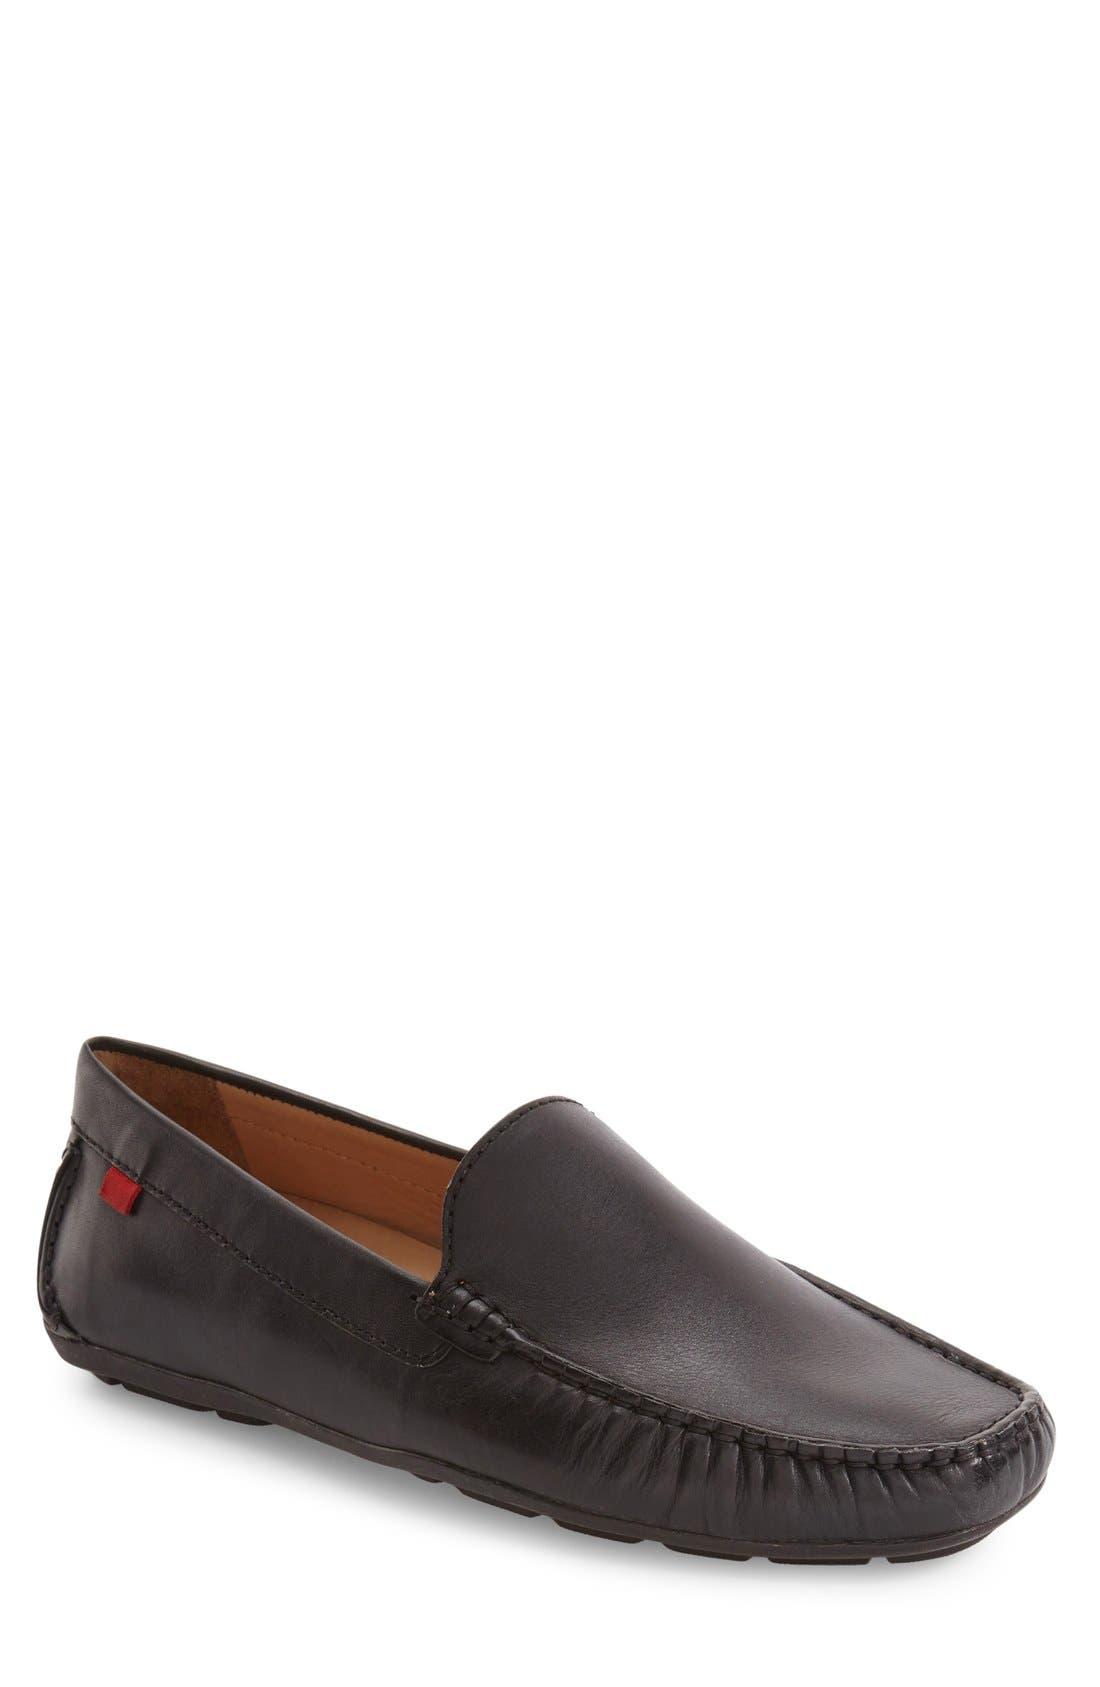 Venetian Driving Loafer,                         Main,                         color, Black